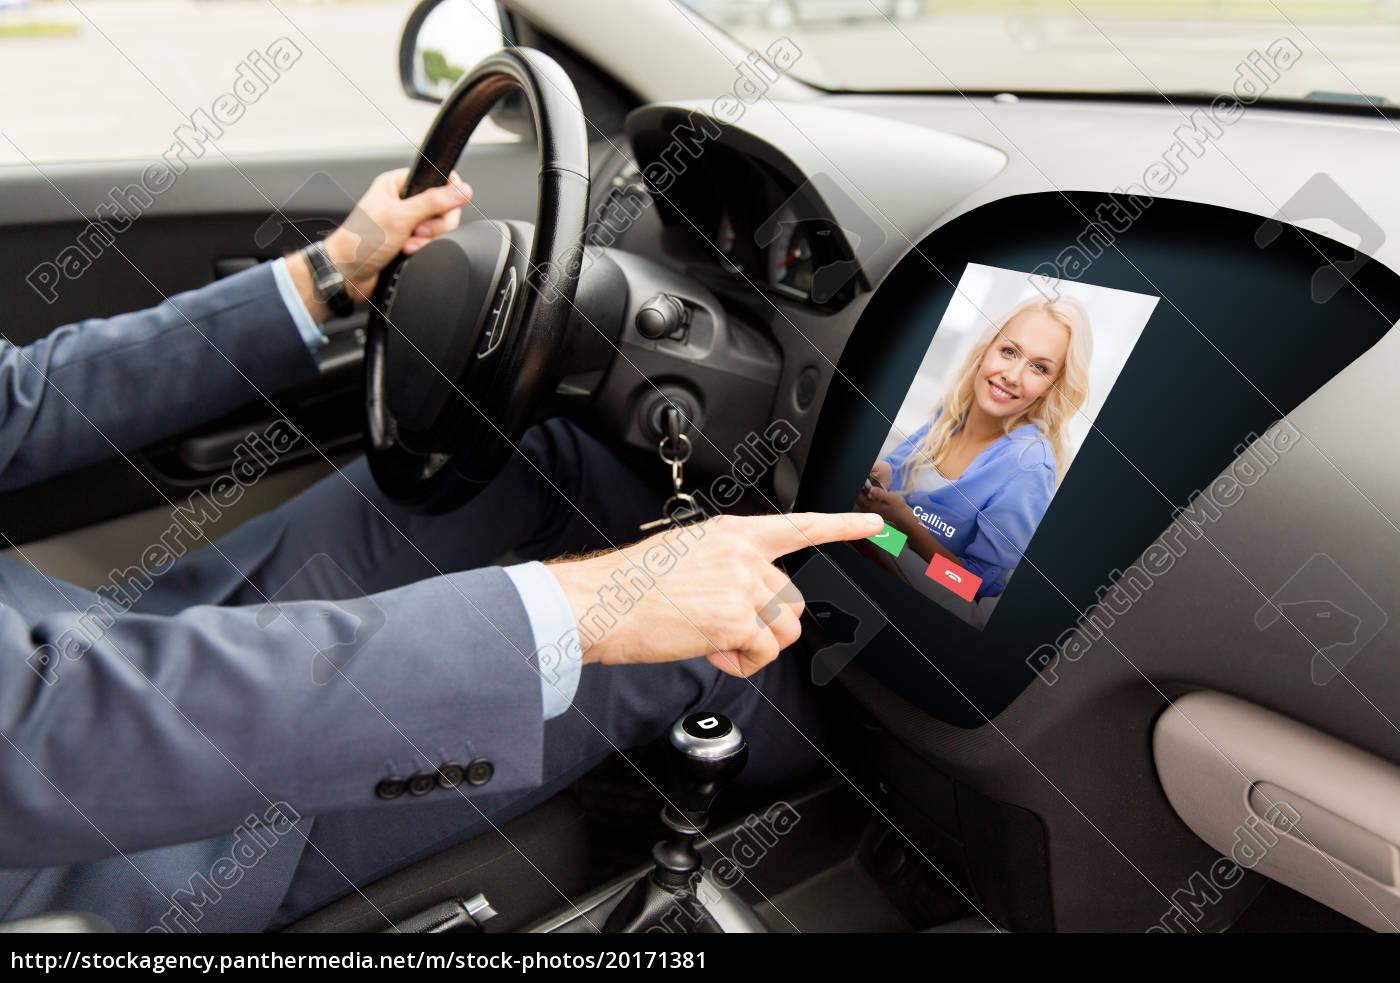 close, up, of, man, driving, car - 20171381